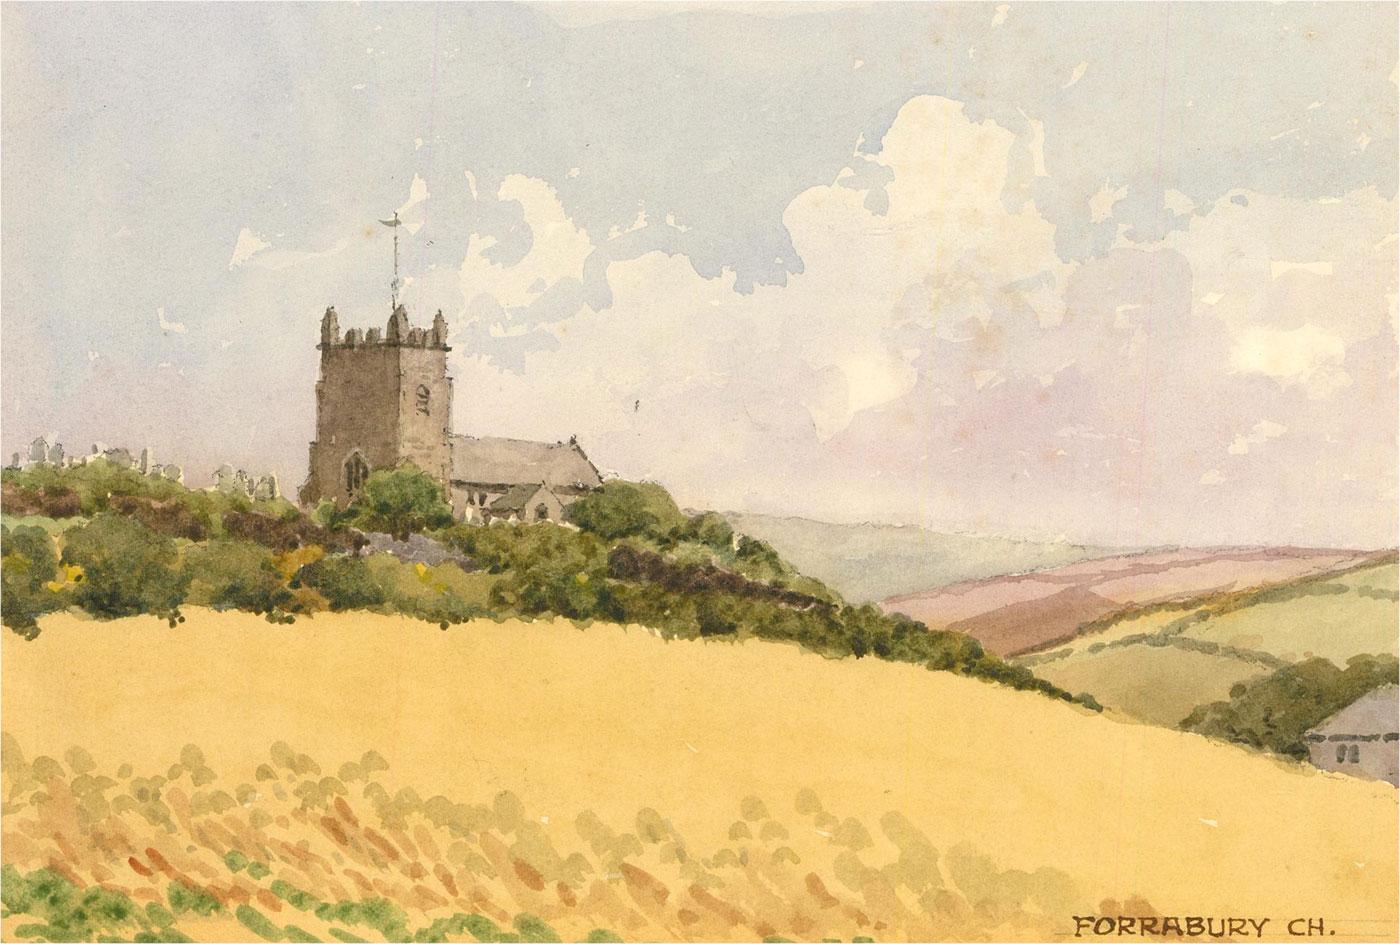 Raymond Turner Barker (1872-1945) - 1931 Watercolour, Forrabury Church